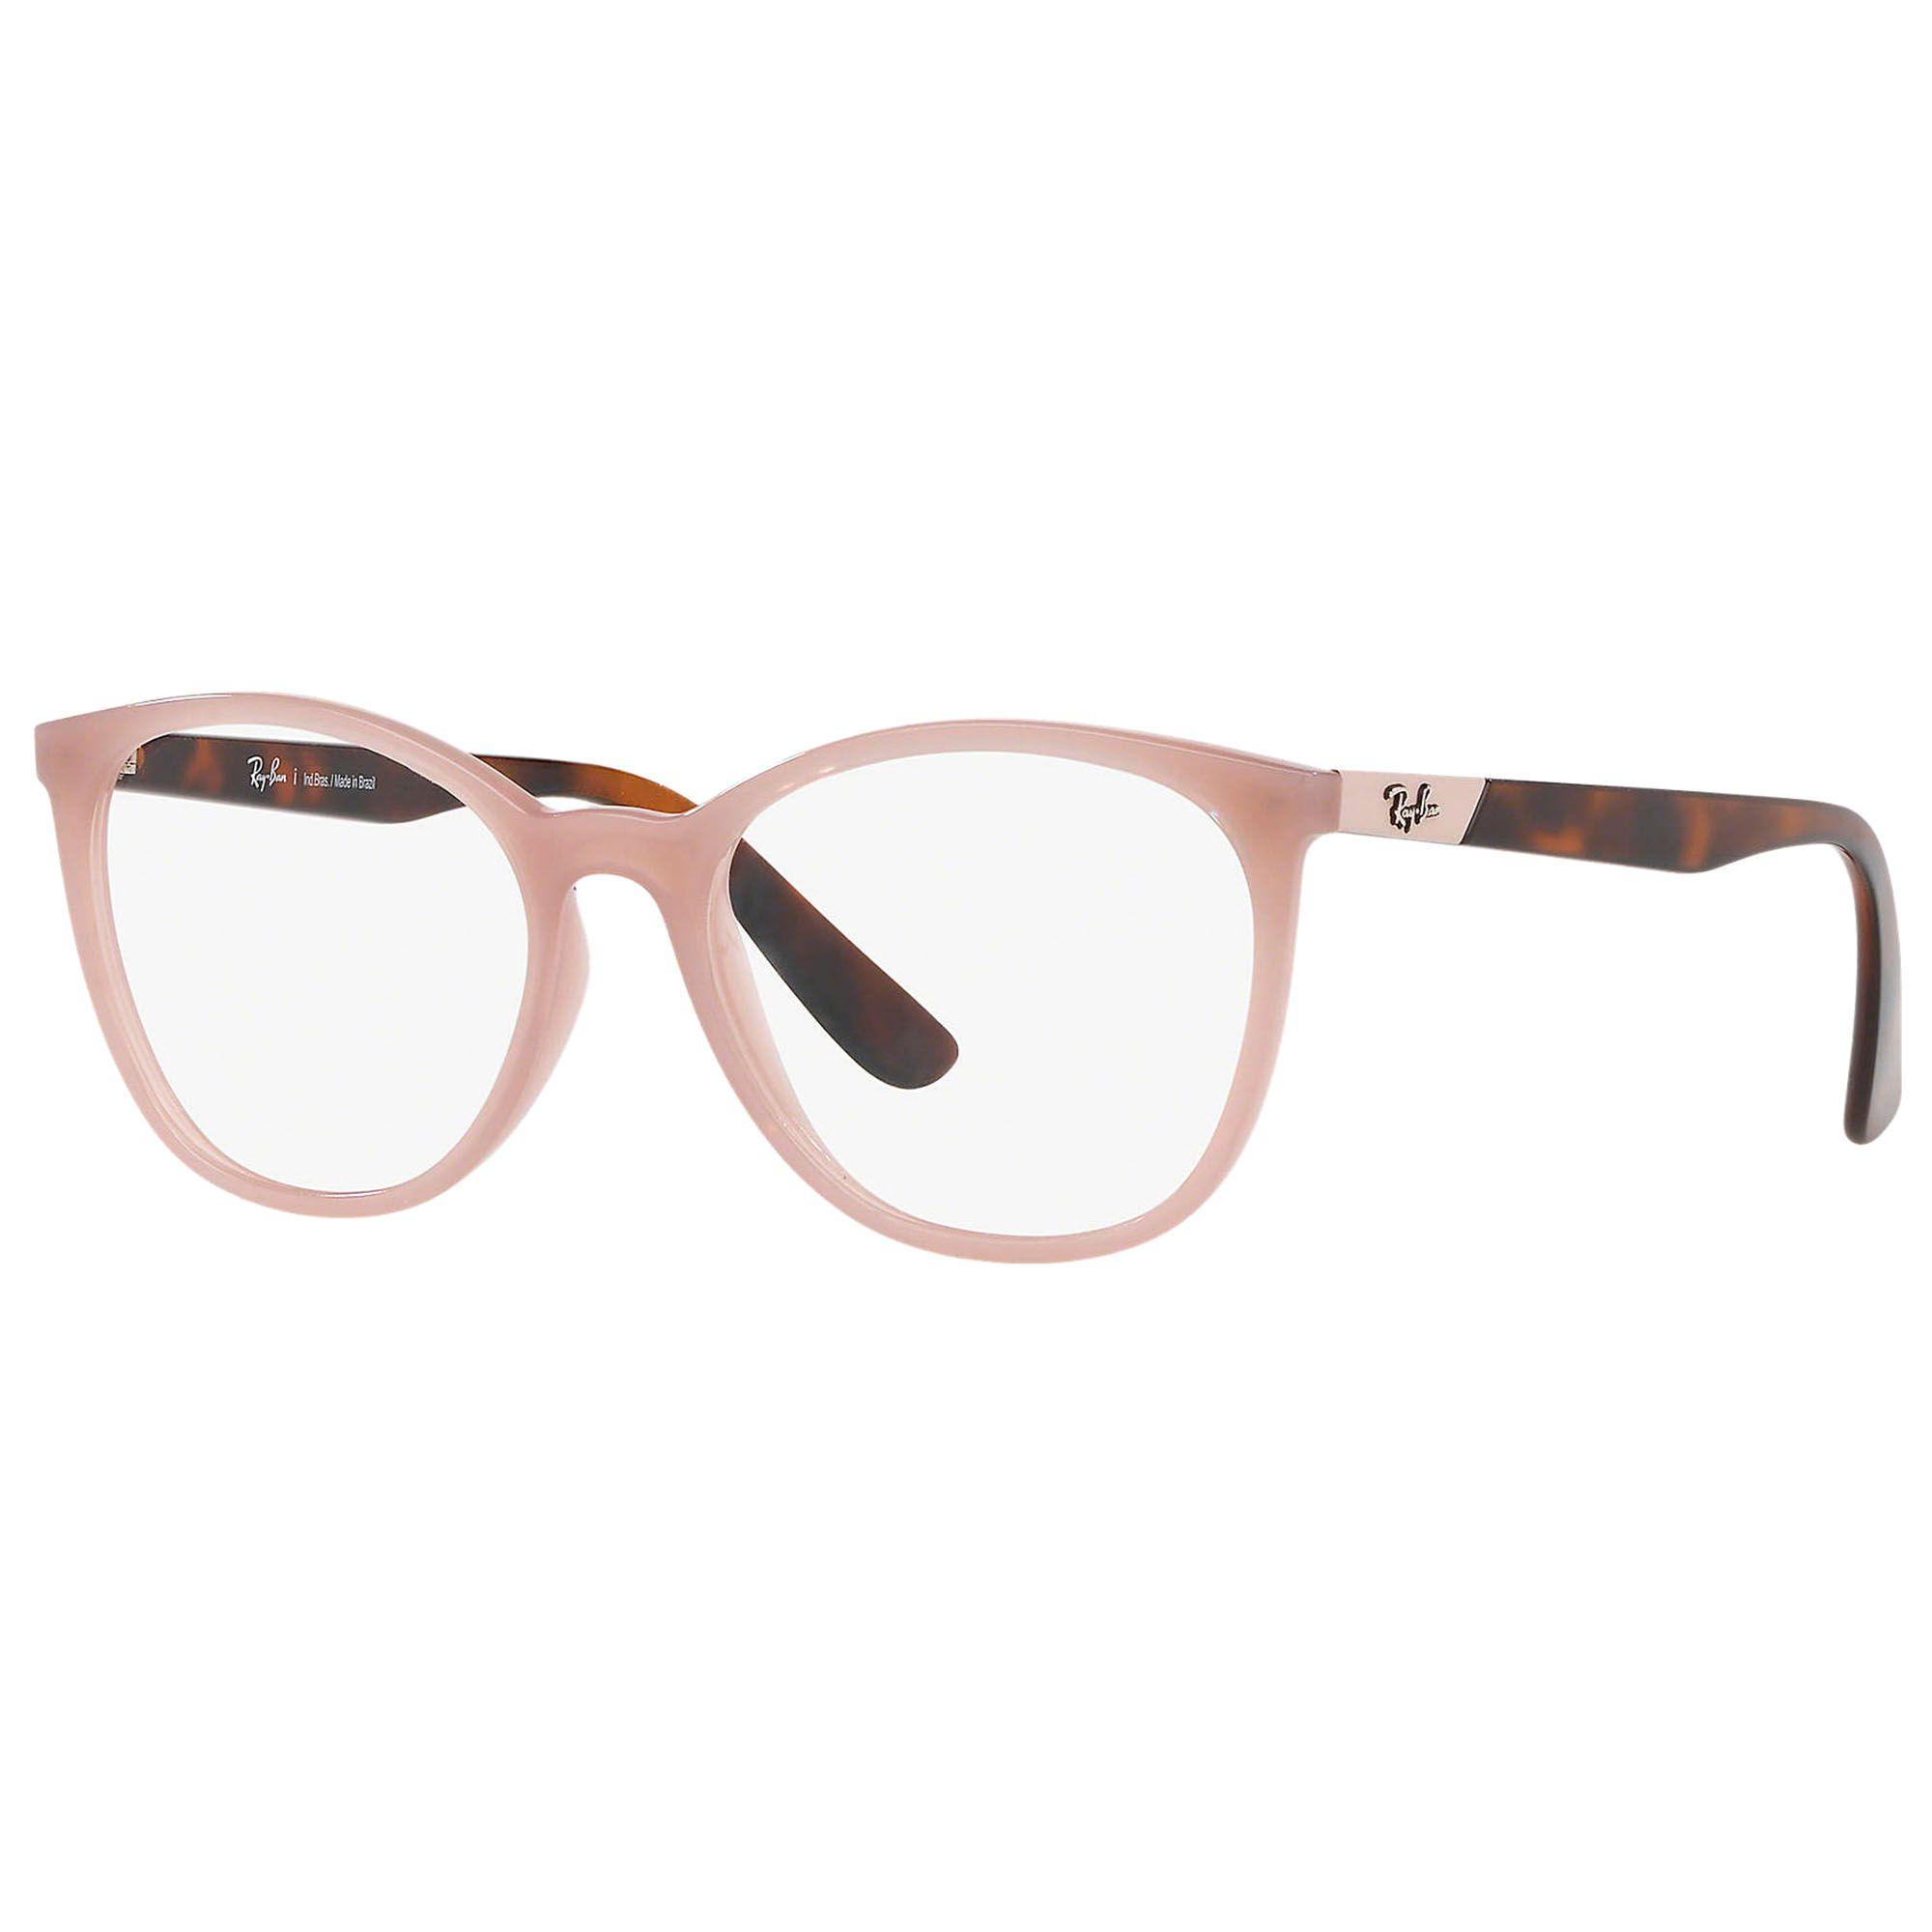 Óculos de Grau Feminino Ray-Ban RB7161L 5892 52-16